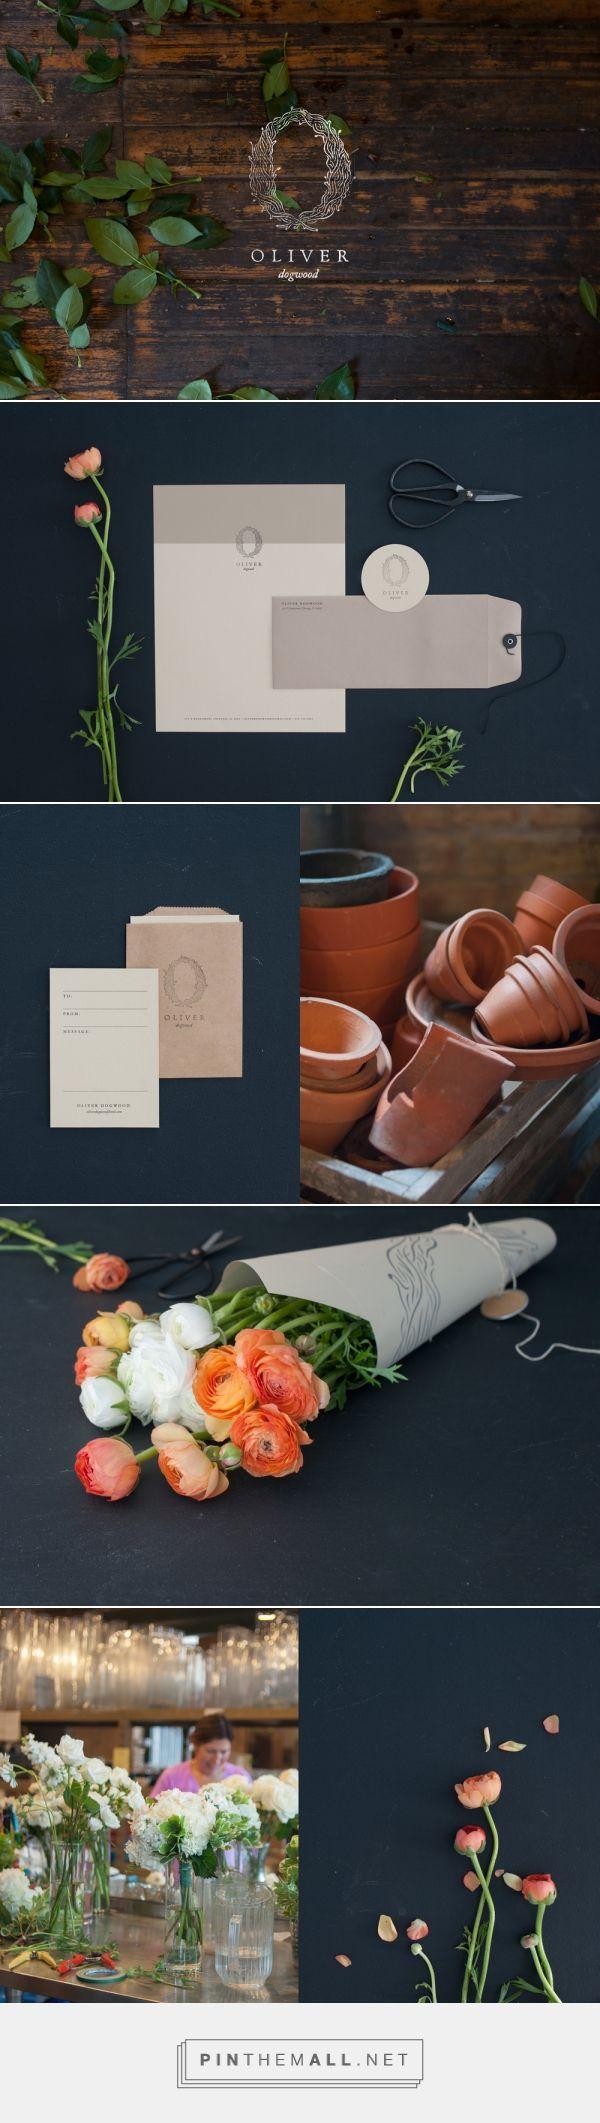 Oliver Dogwood Branding by The McQuades | Fivestar Branding – Design and Branding Agency & Inspiration Gallery